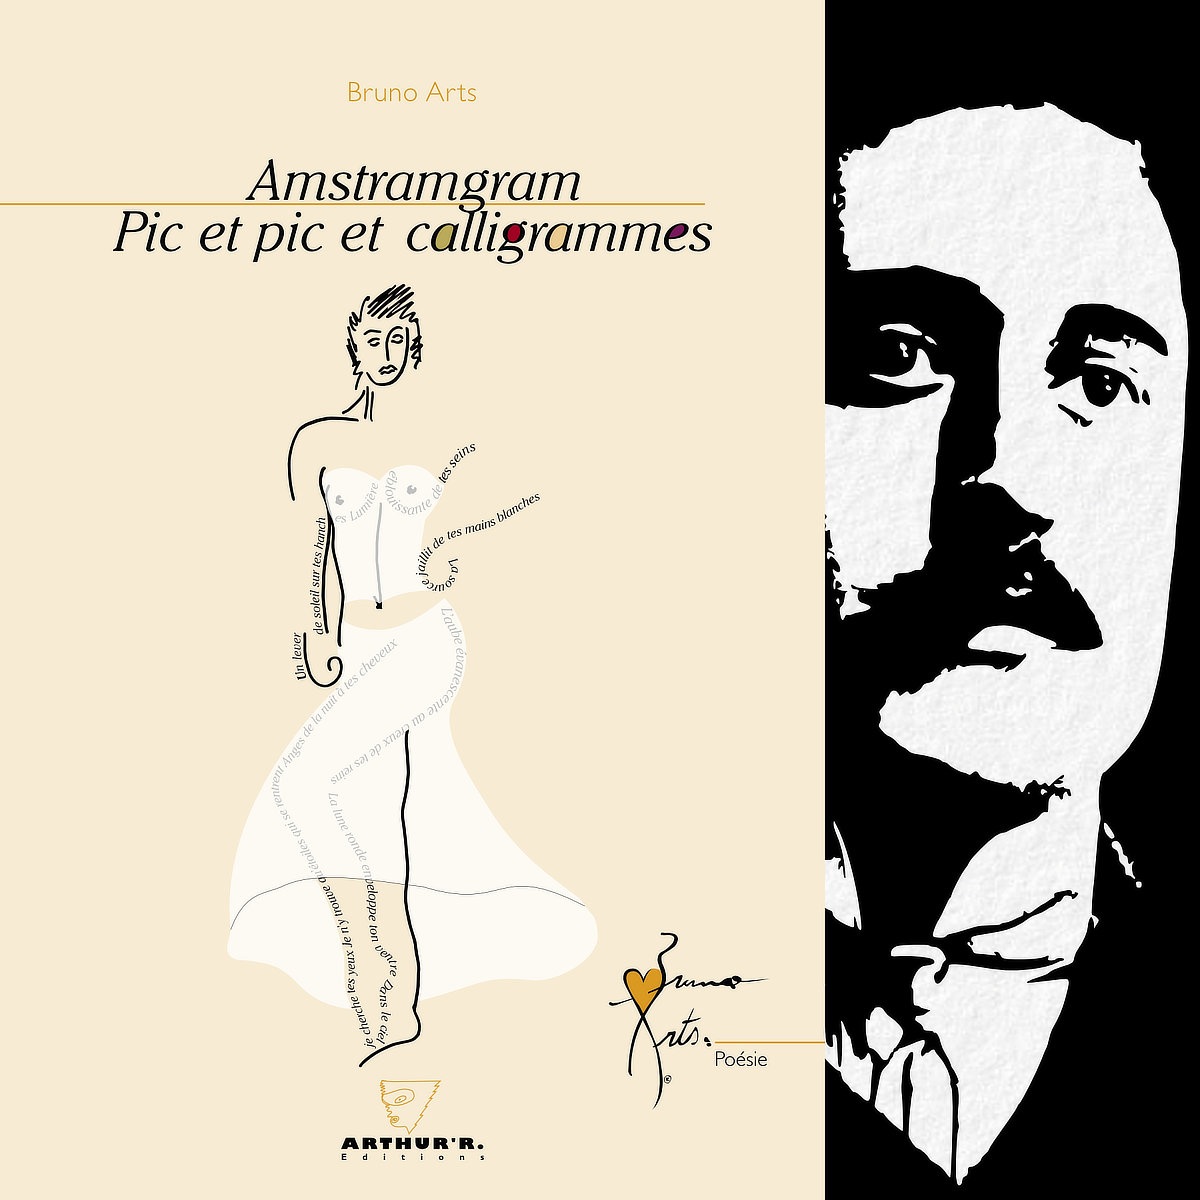 Amstramgram Pic et pic et calligrammes